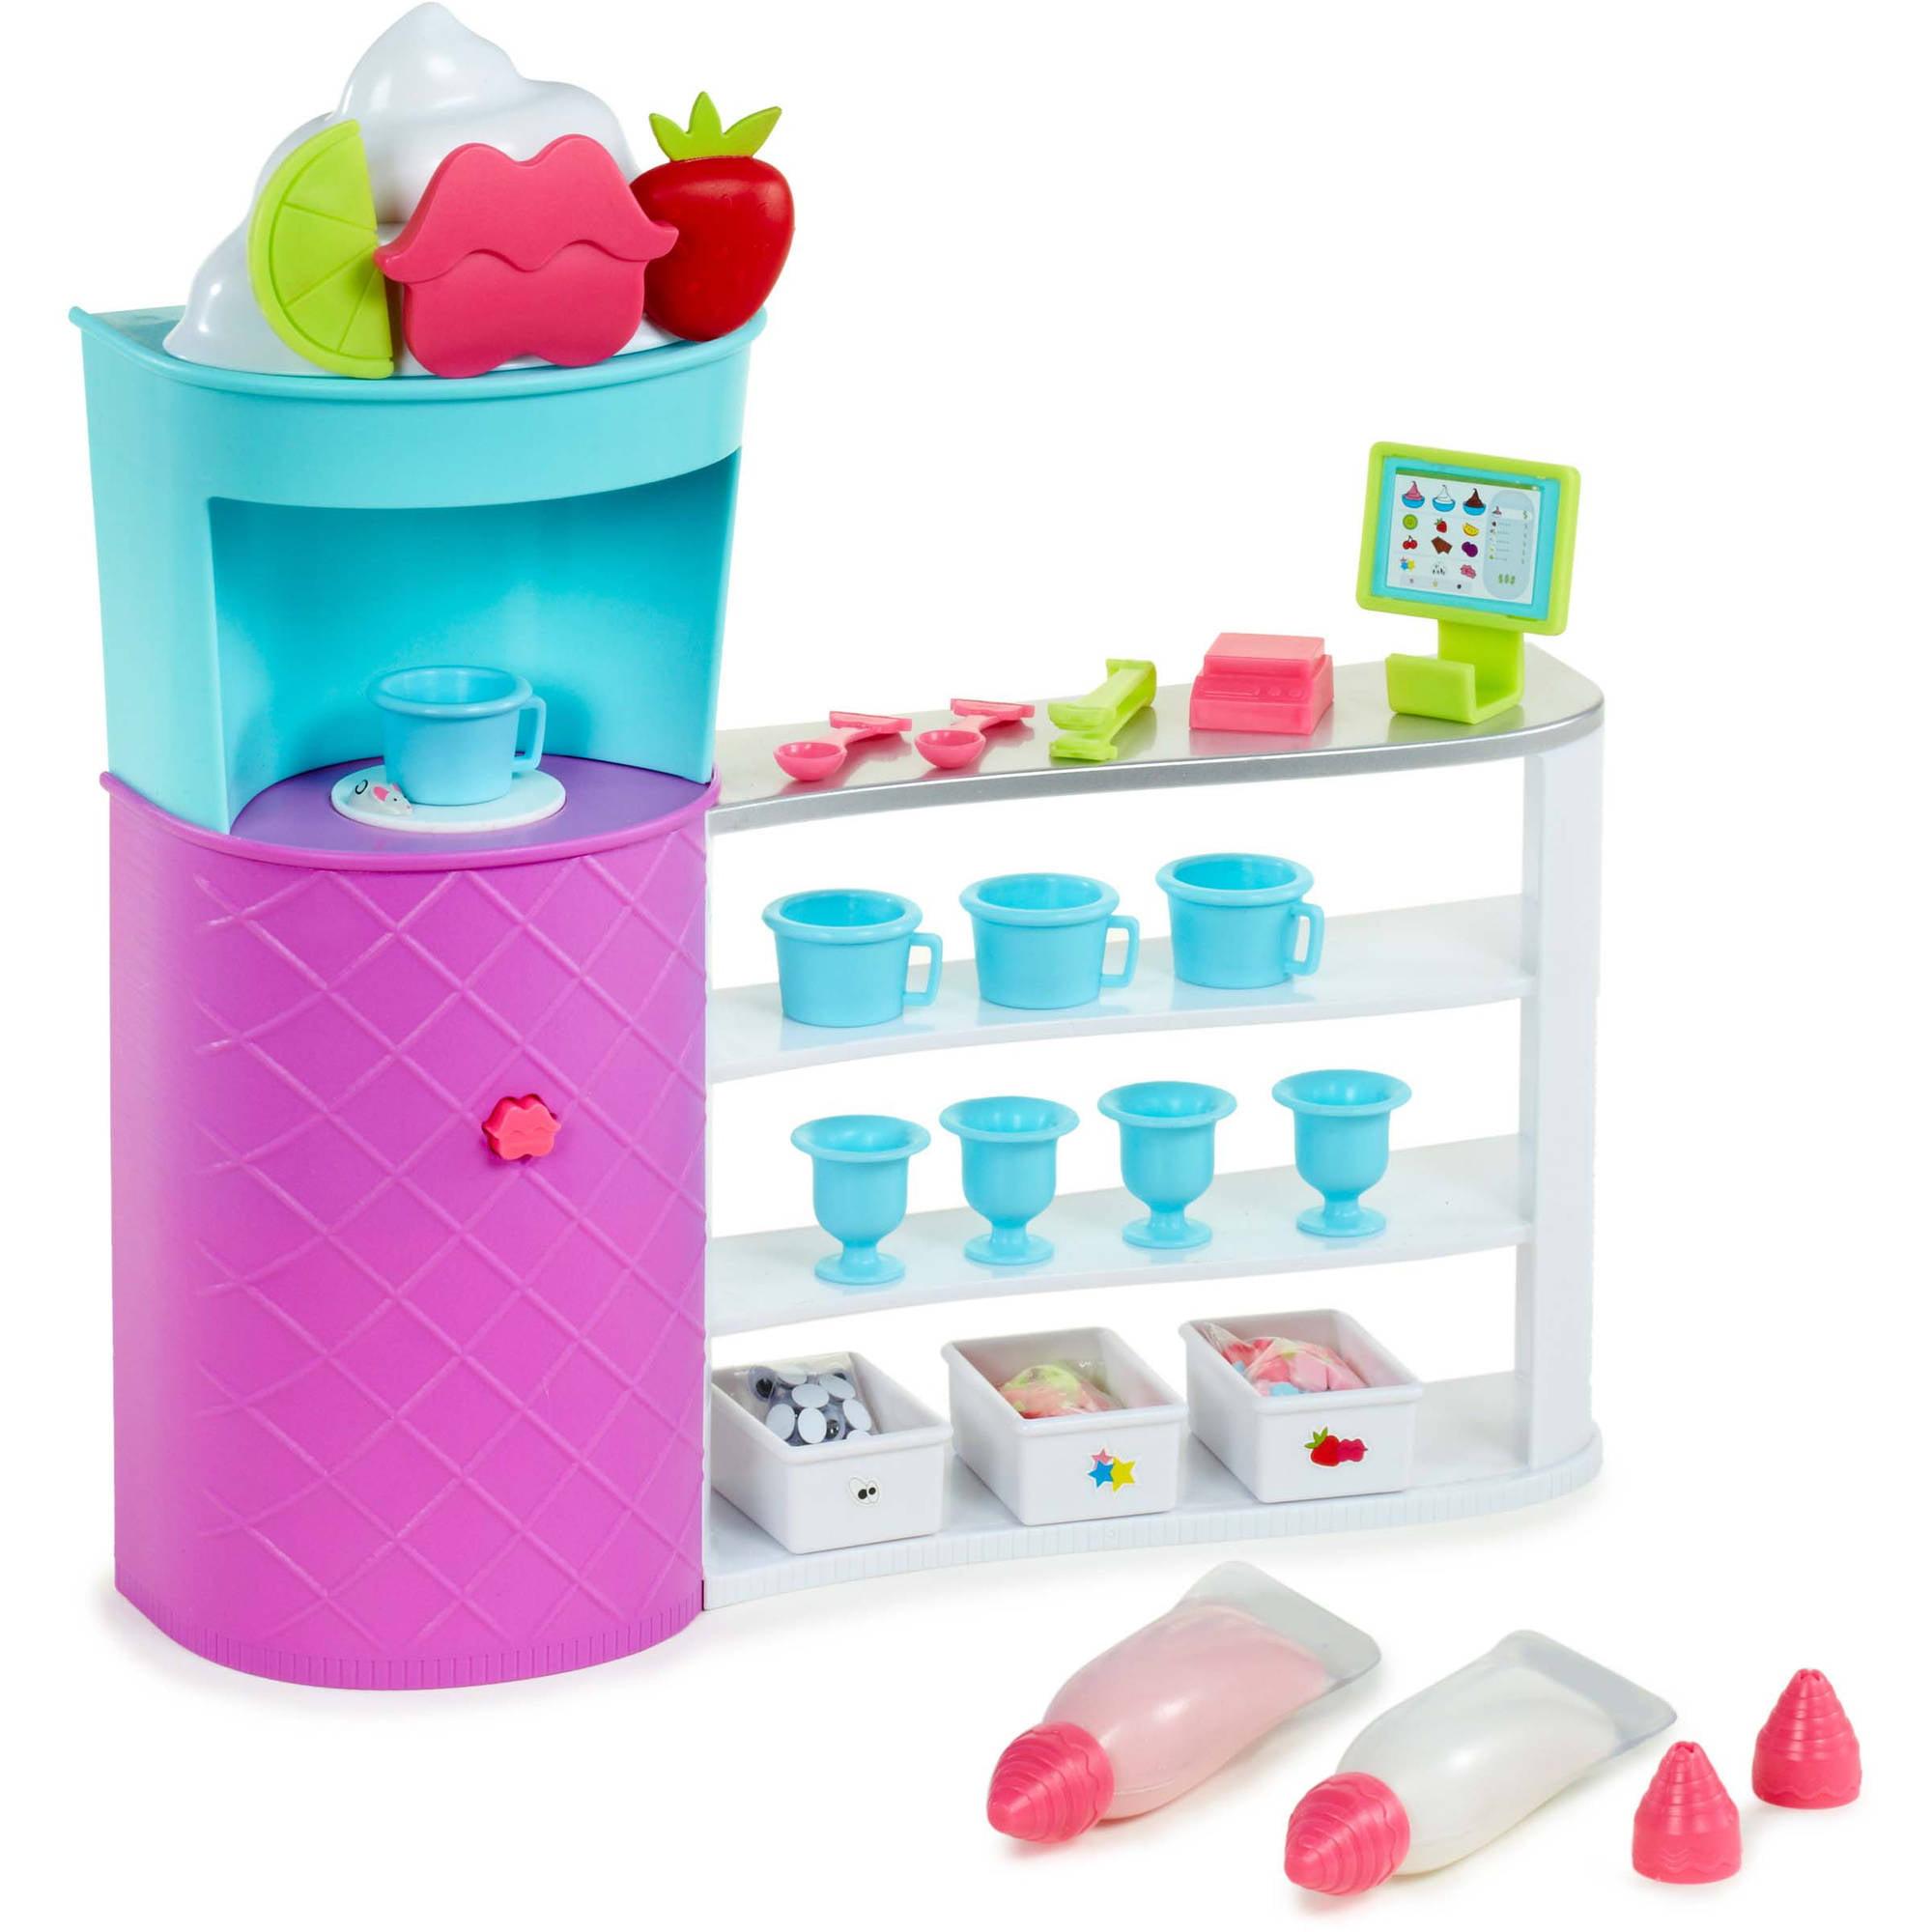 Bratz CIY Sweet Shoppe Activity Playset by MGA Entertainment